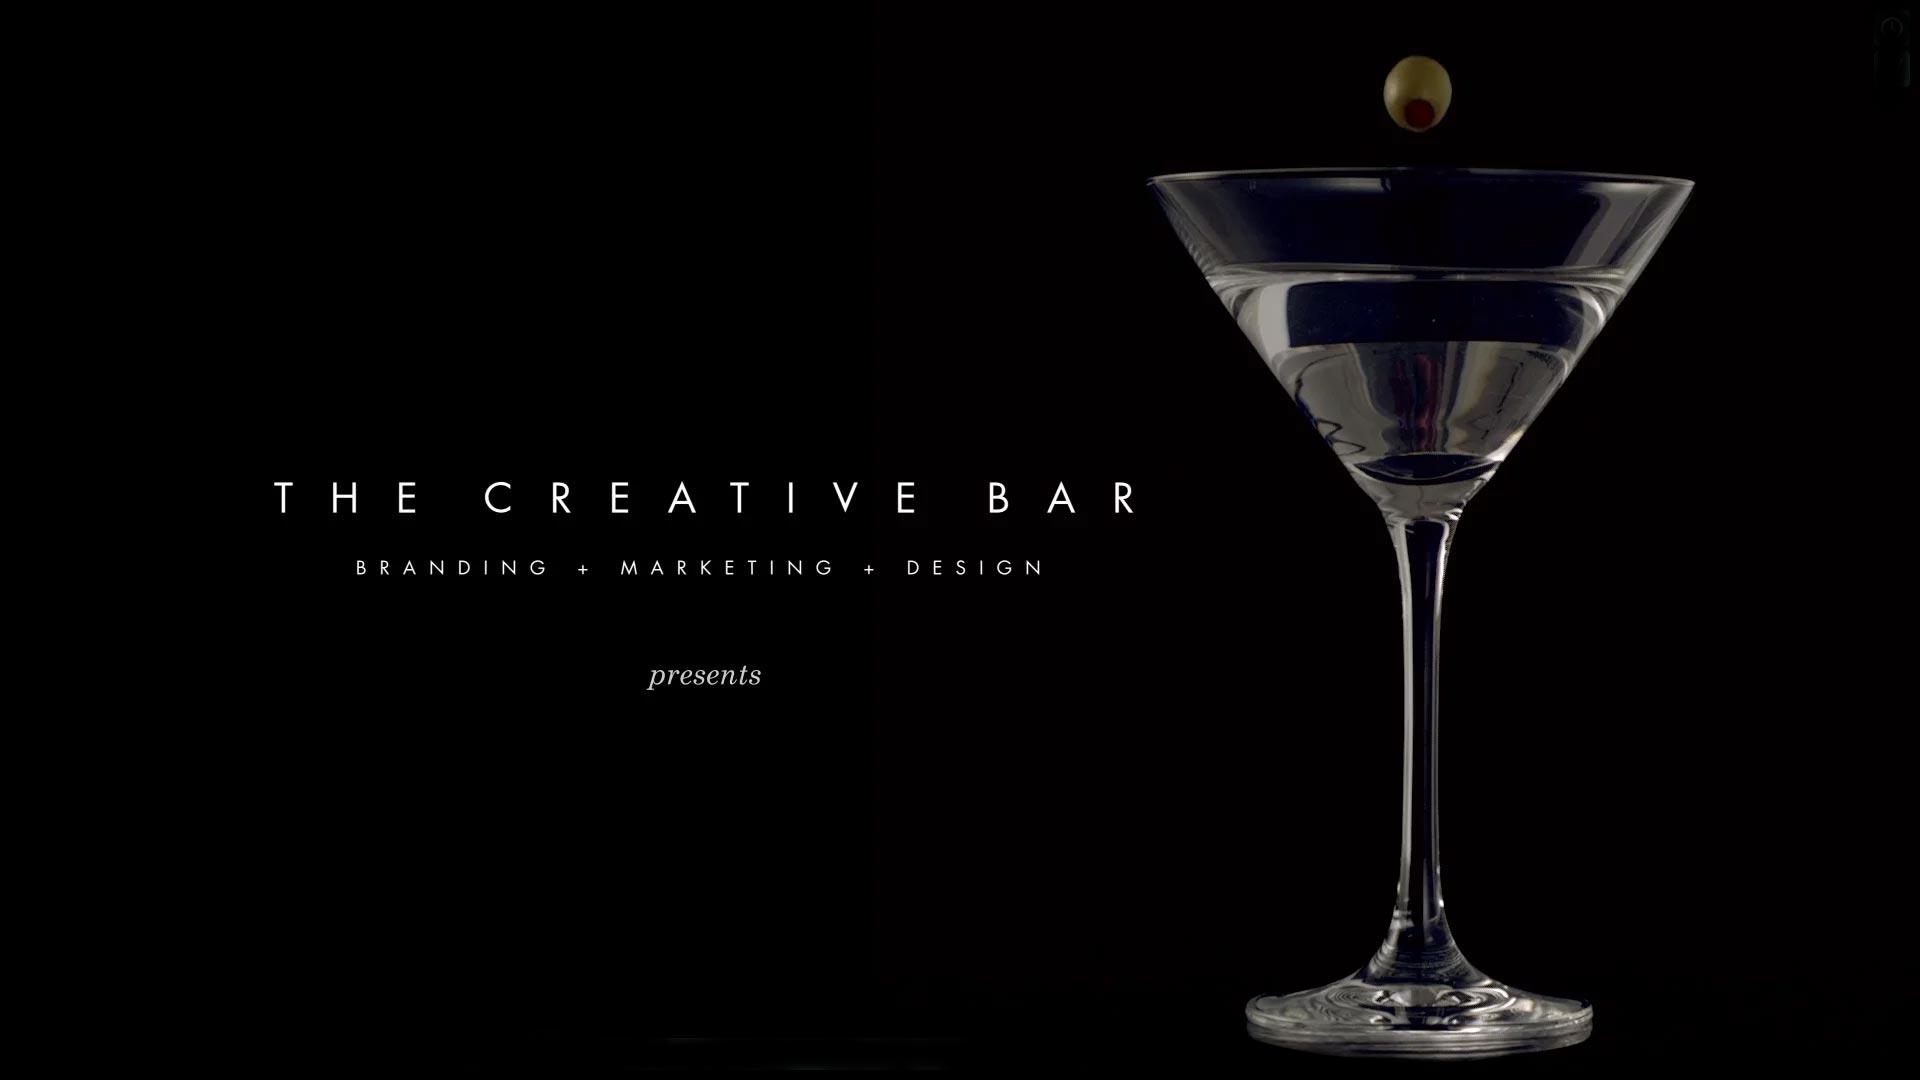 189078539 video. About The Creative Bar Branding   Design Agency    The Creative Bar